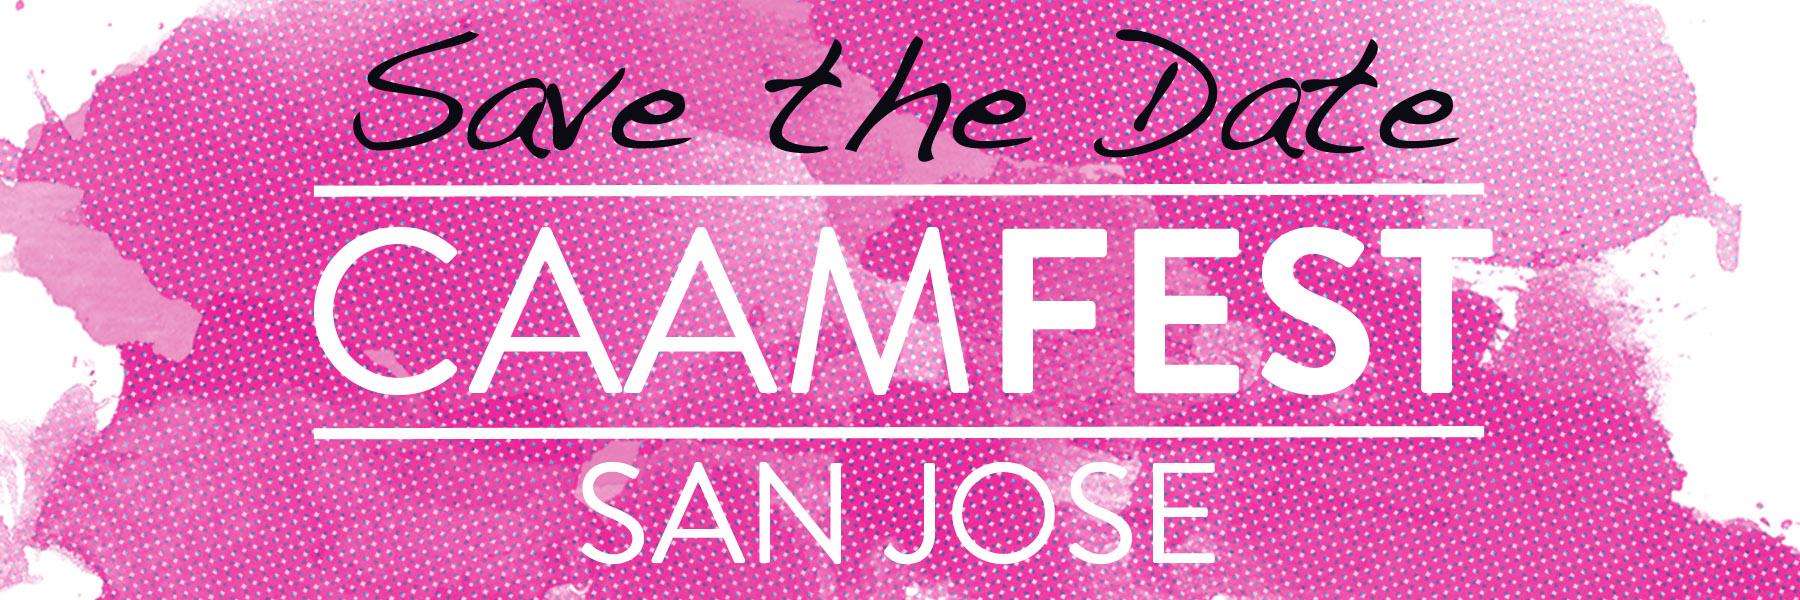 CAAMFest San Jose Coming September